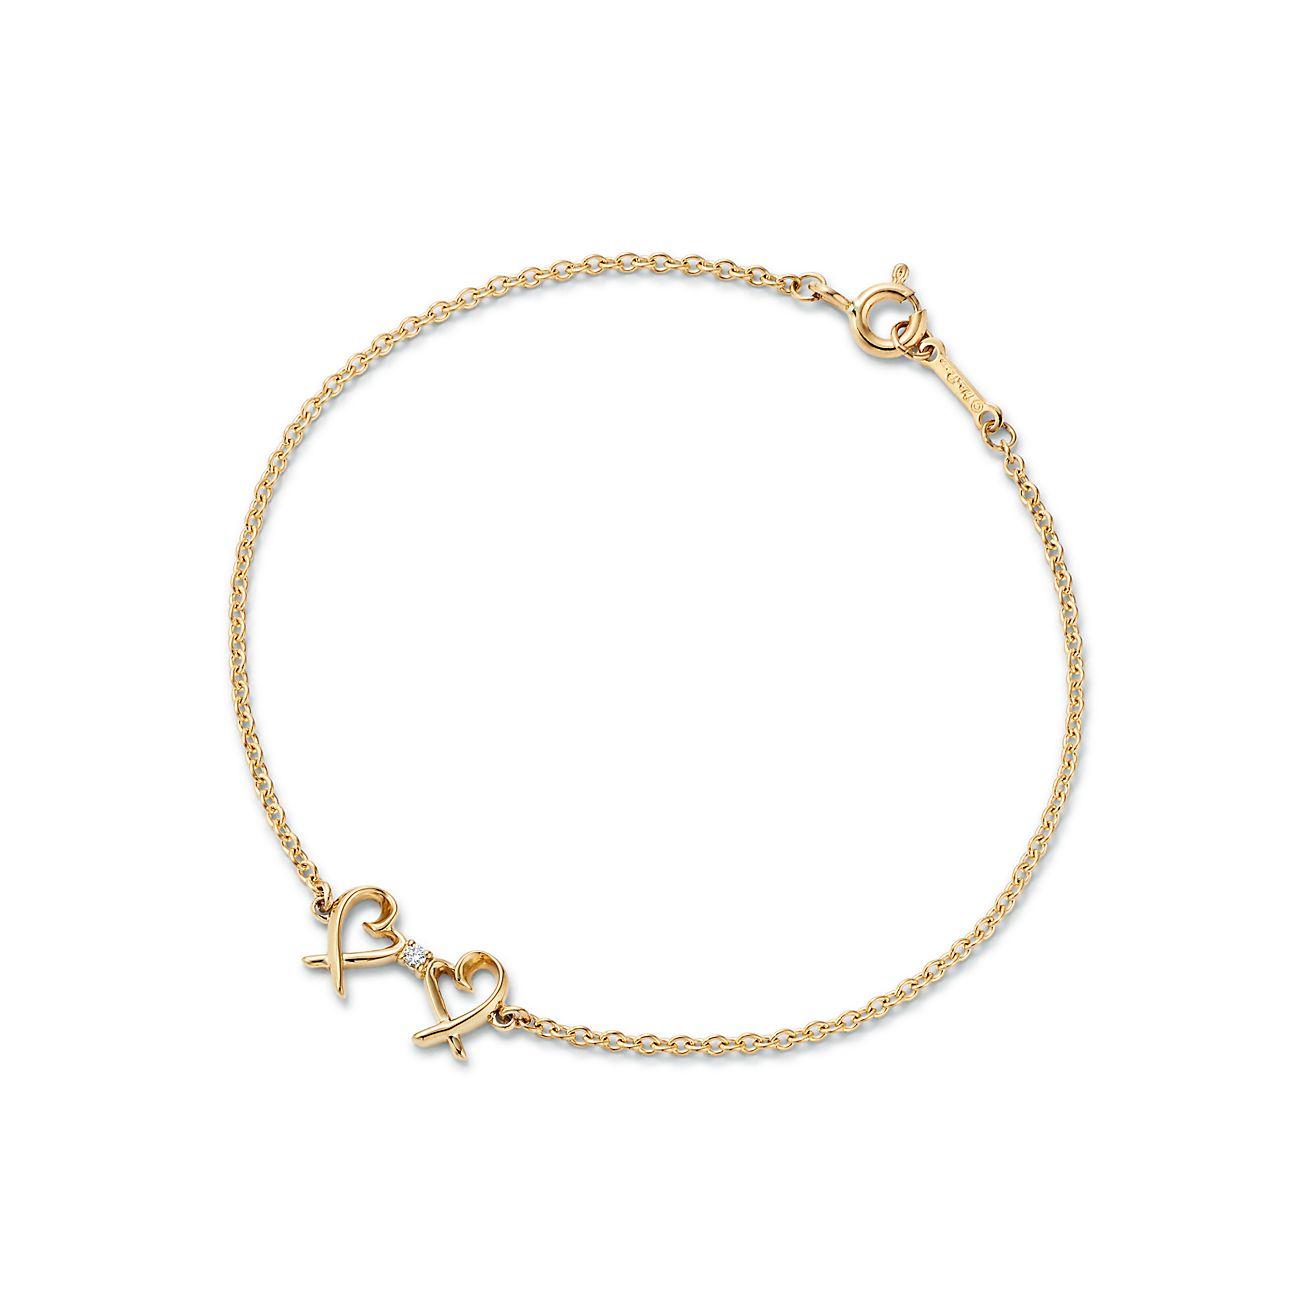 Paloma Pico Double Loving Heart Bracelet